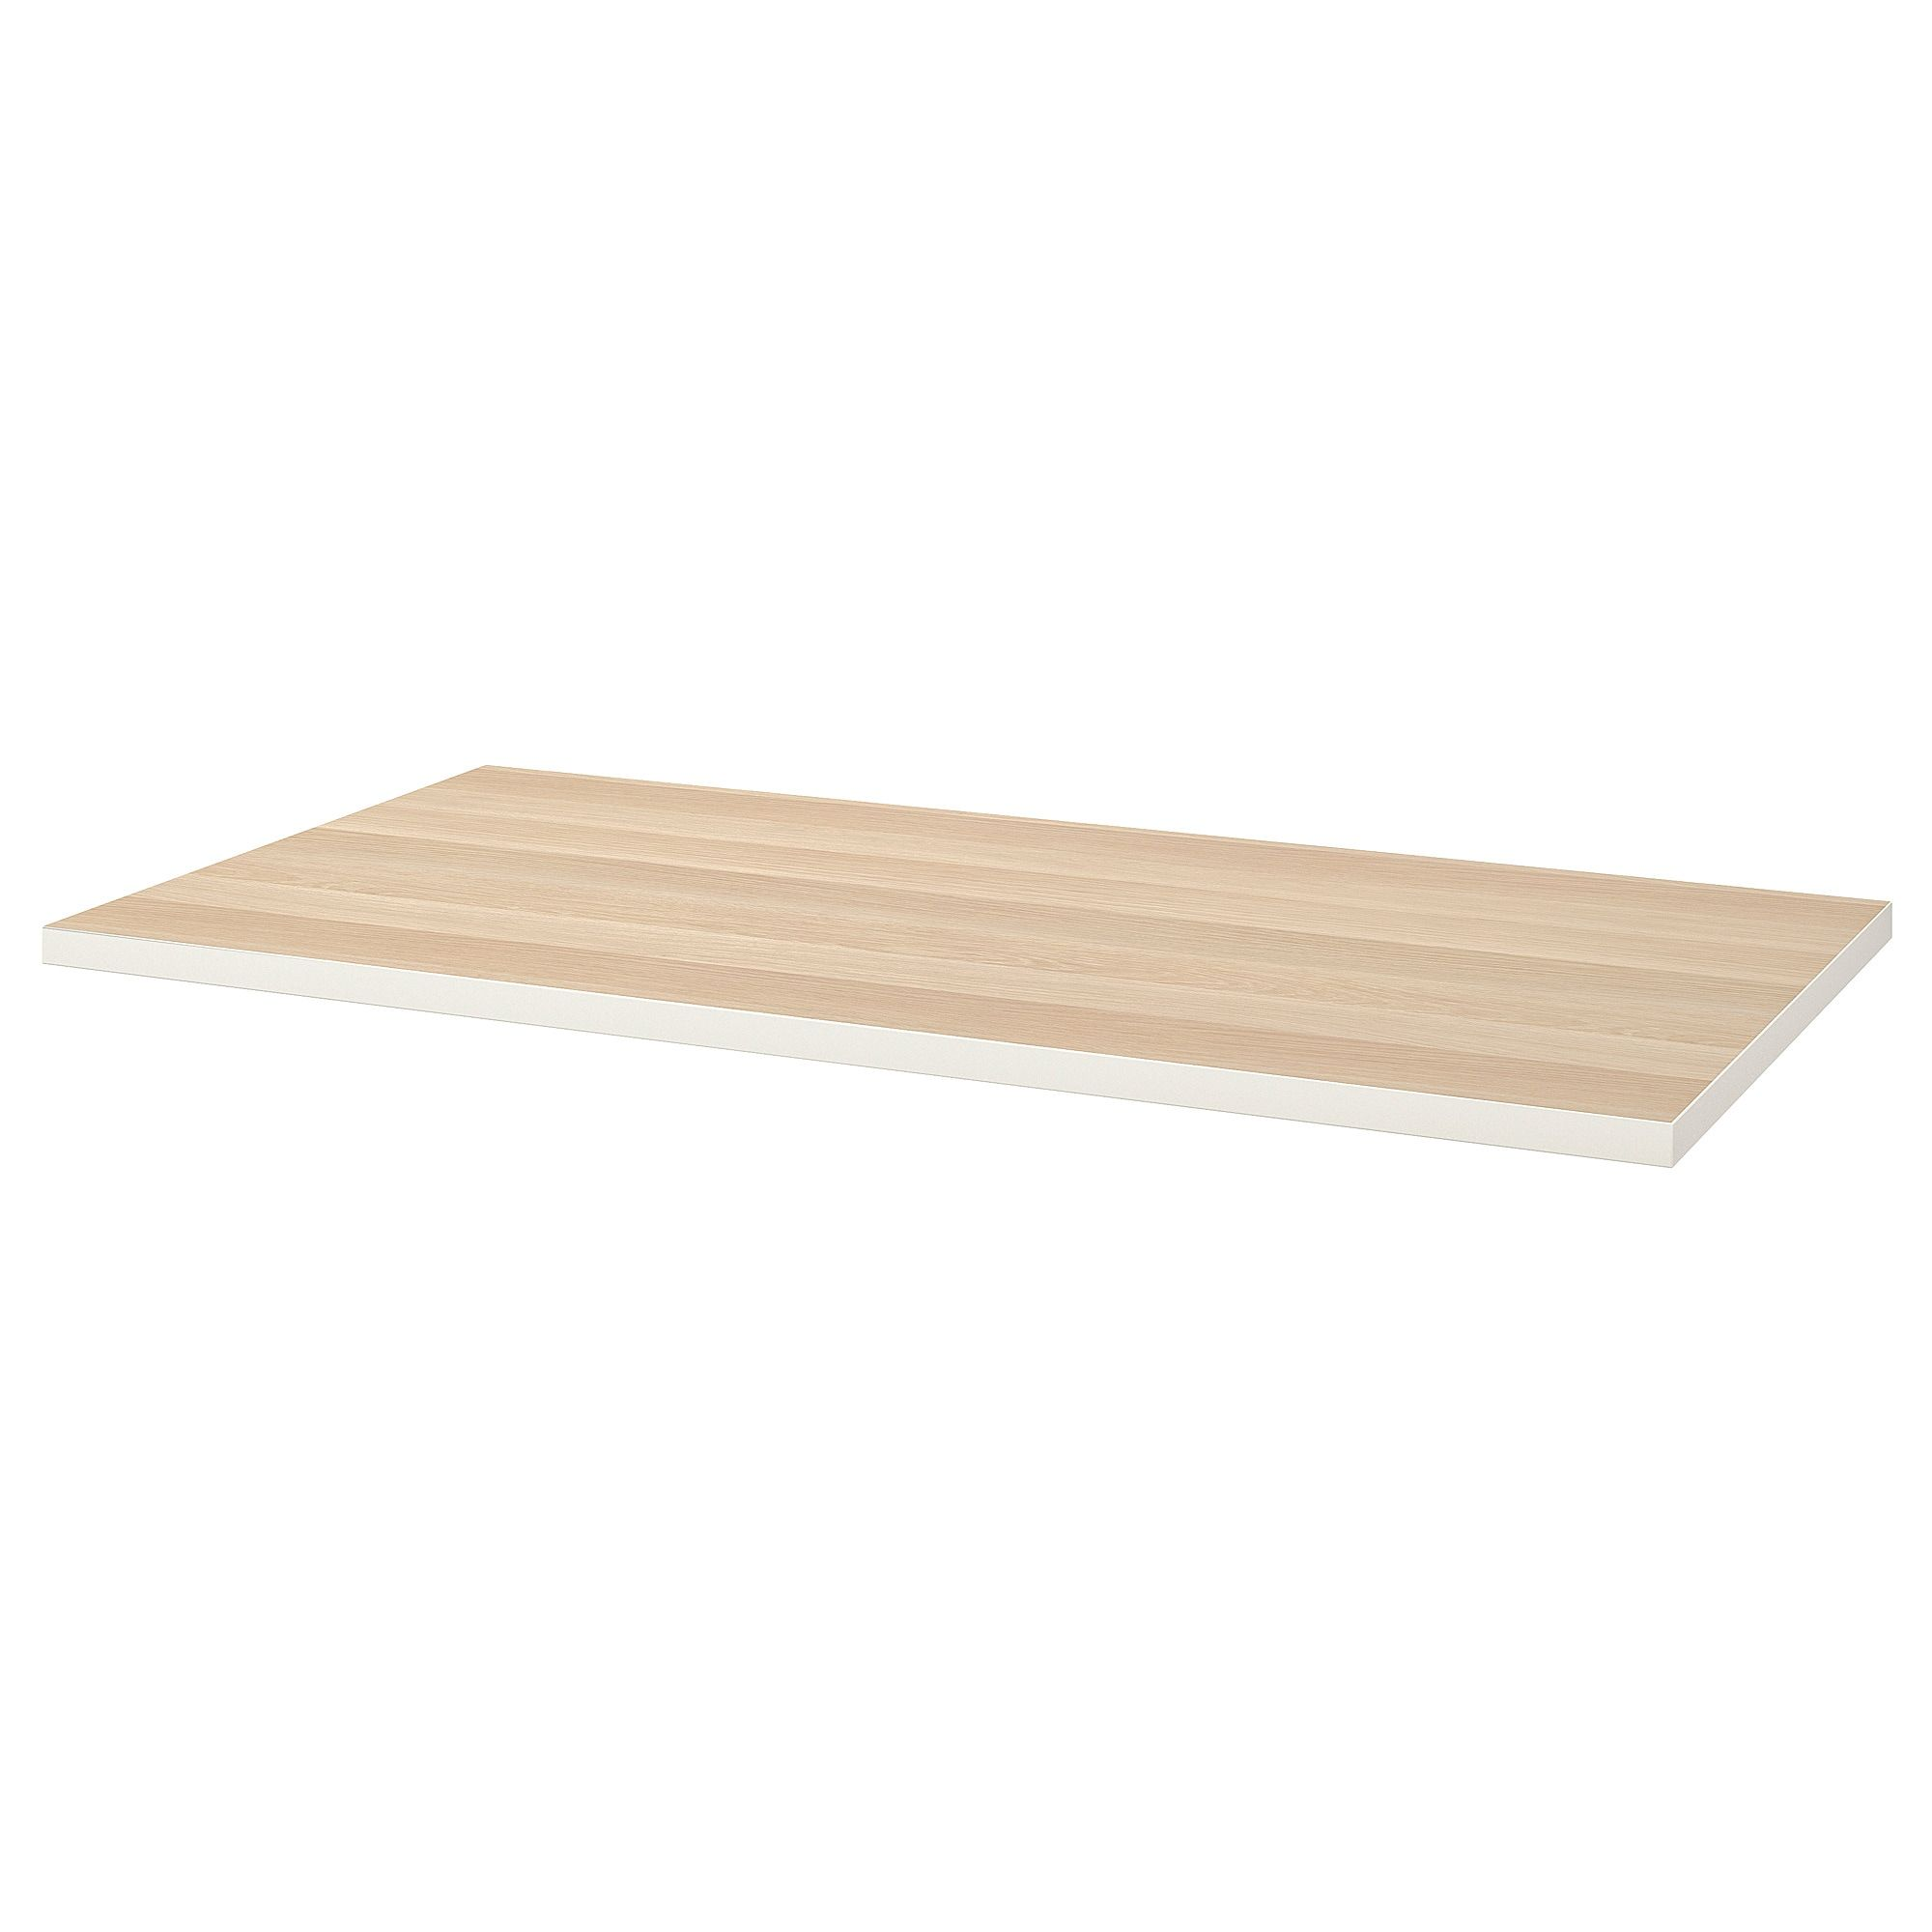 Linnmon Tabletop White White Stained Oak Effect 59x29 1 2 Ikea Linnmon Table Top White Stain Ikea